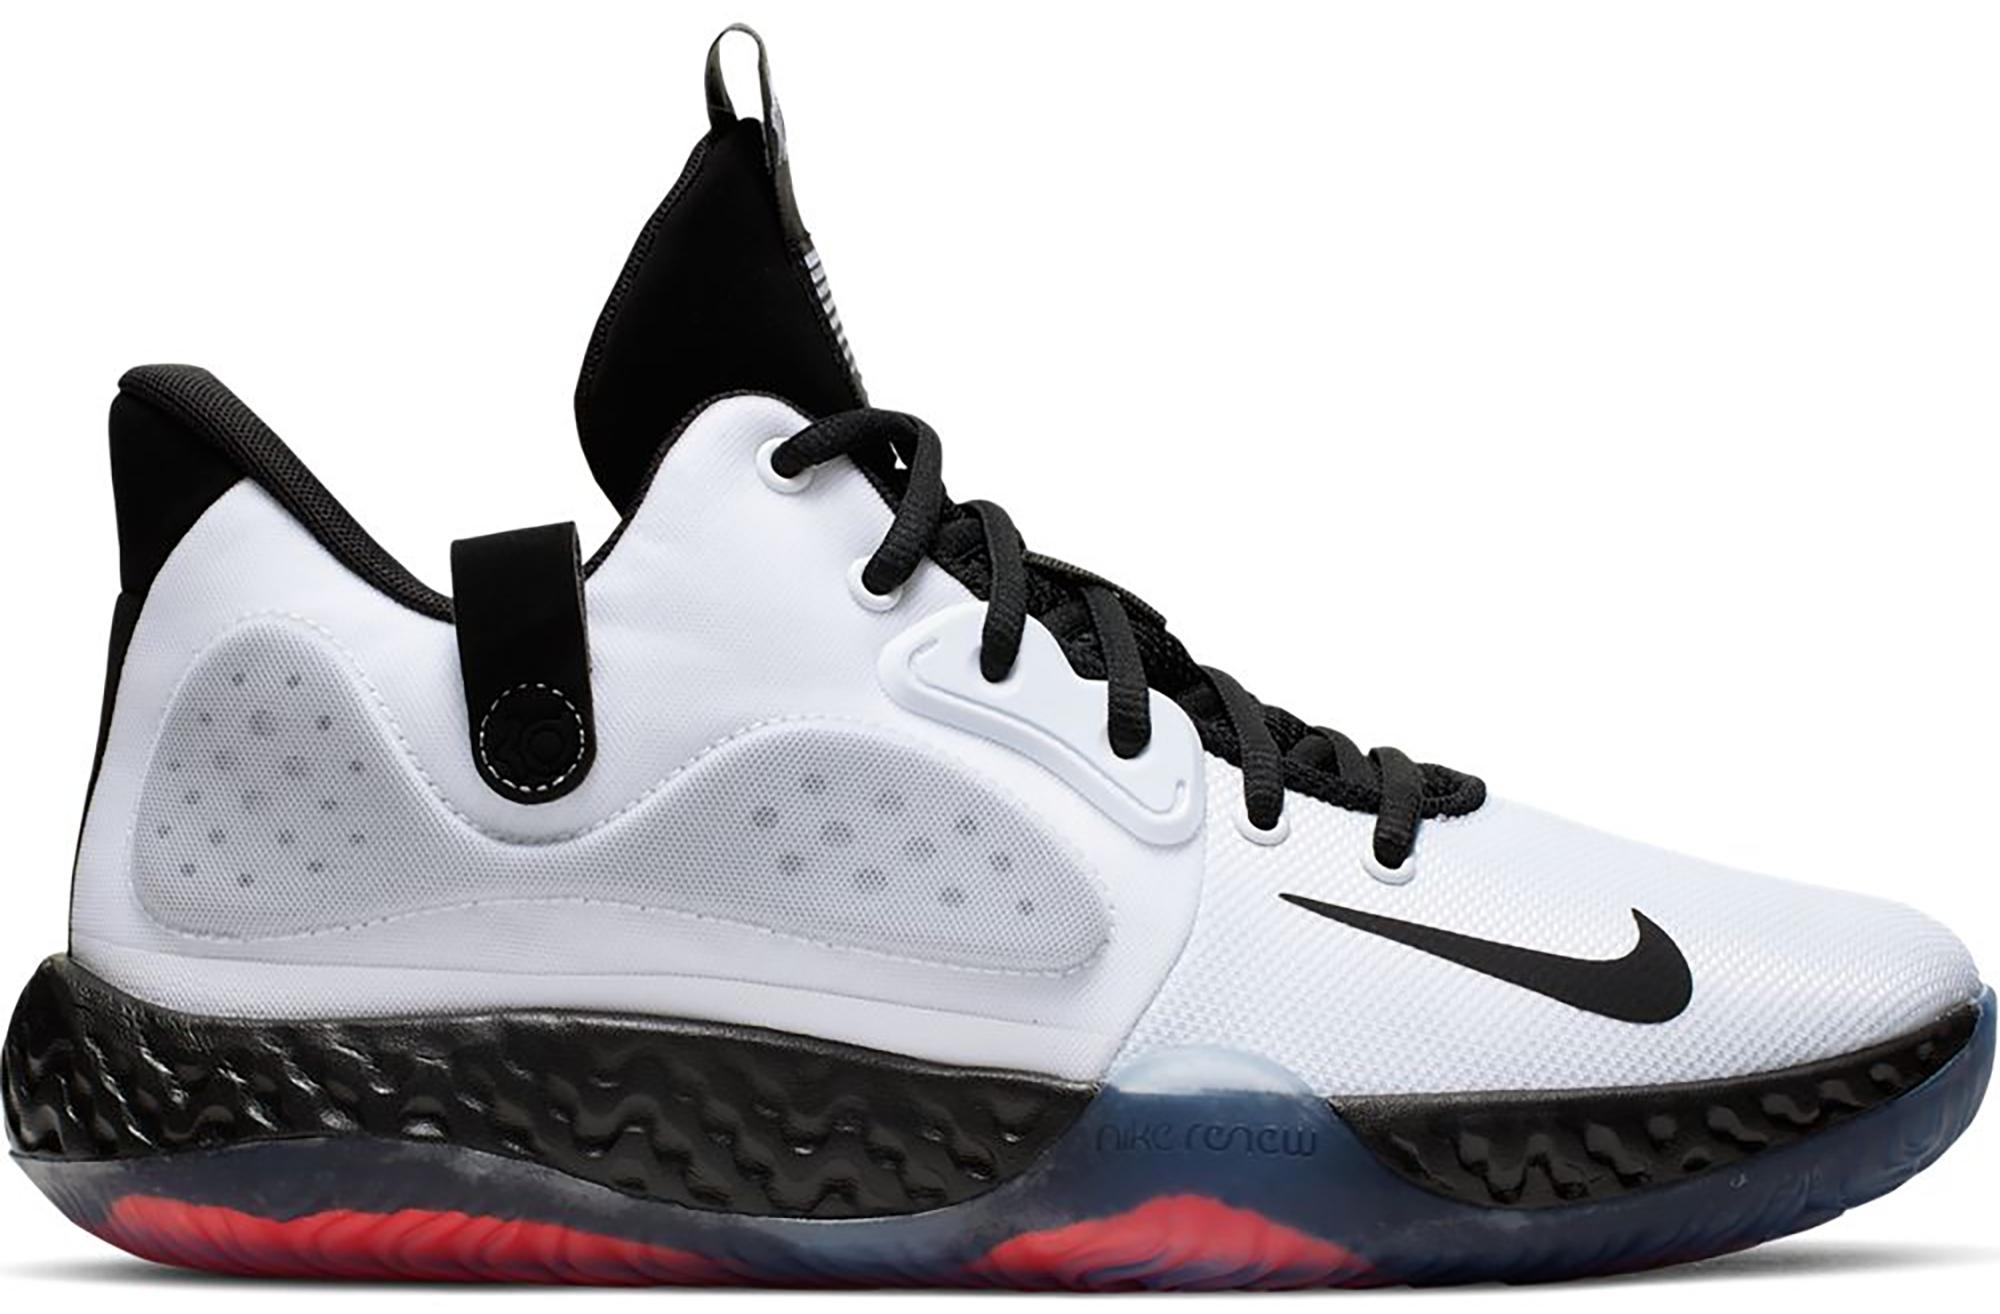 Nike KD Trey 5 VII White Bright Crimson